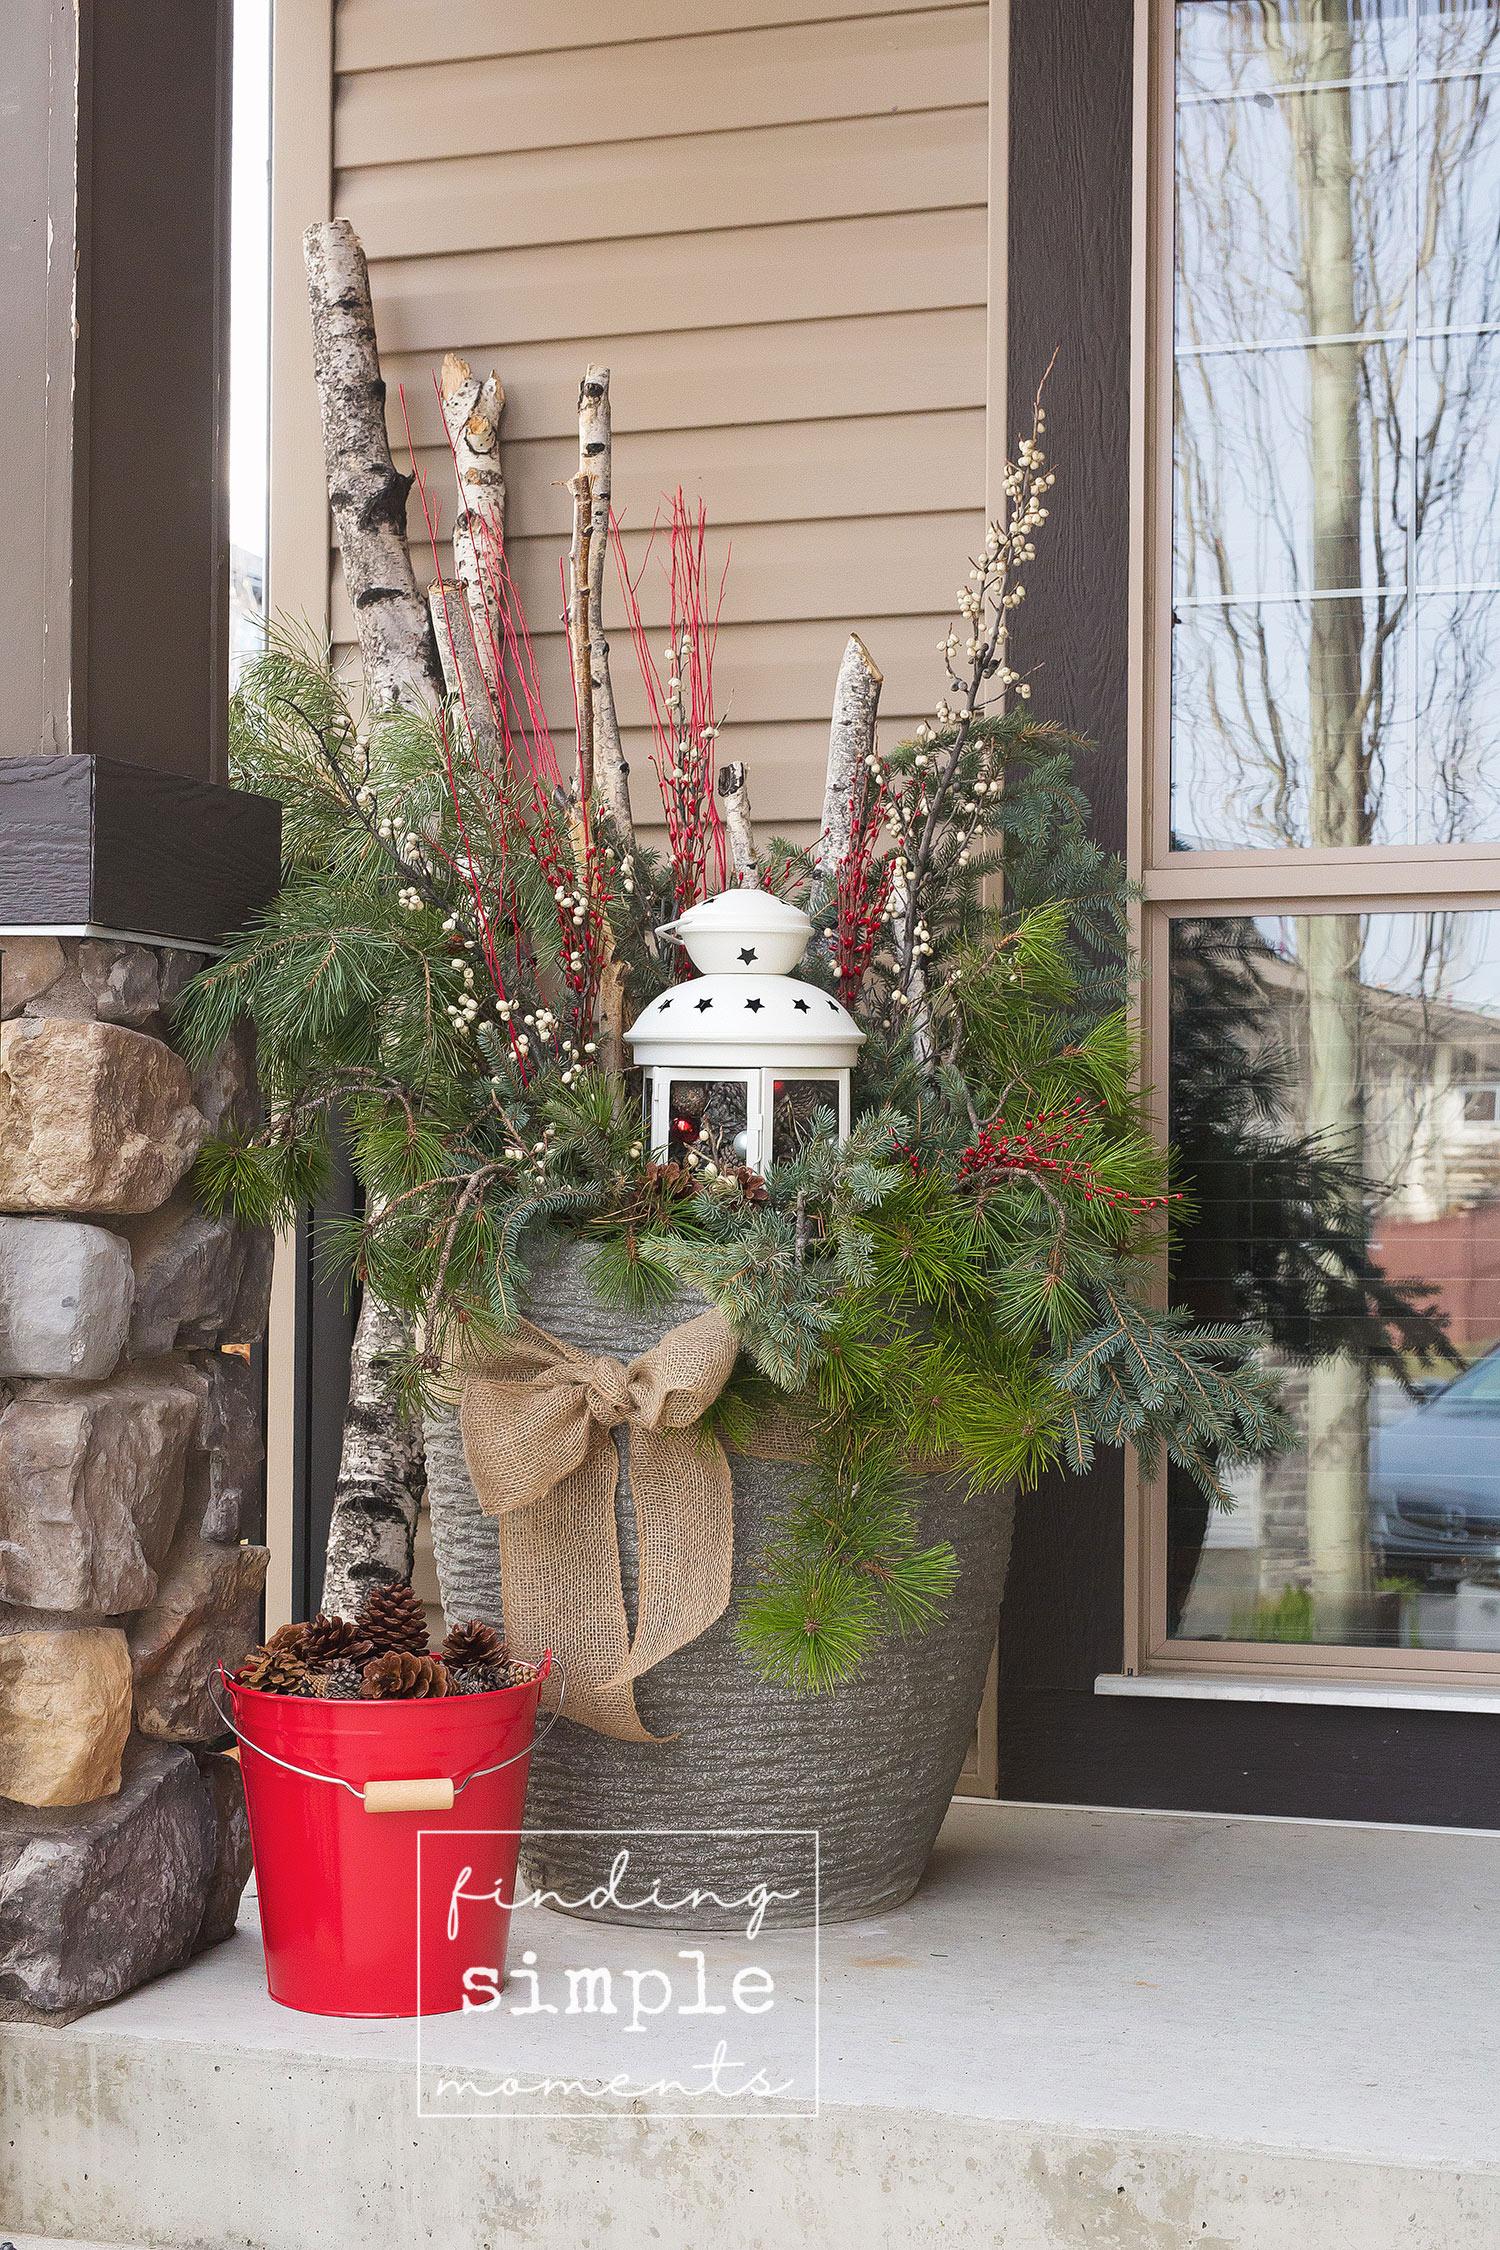 diy-winter-planters-17.jpg